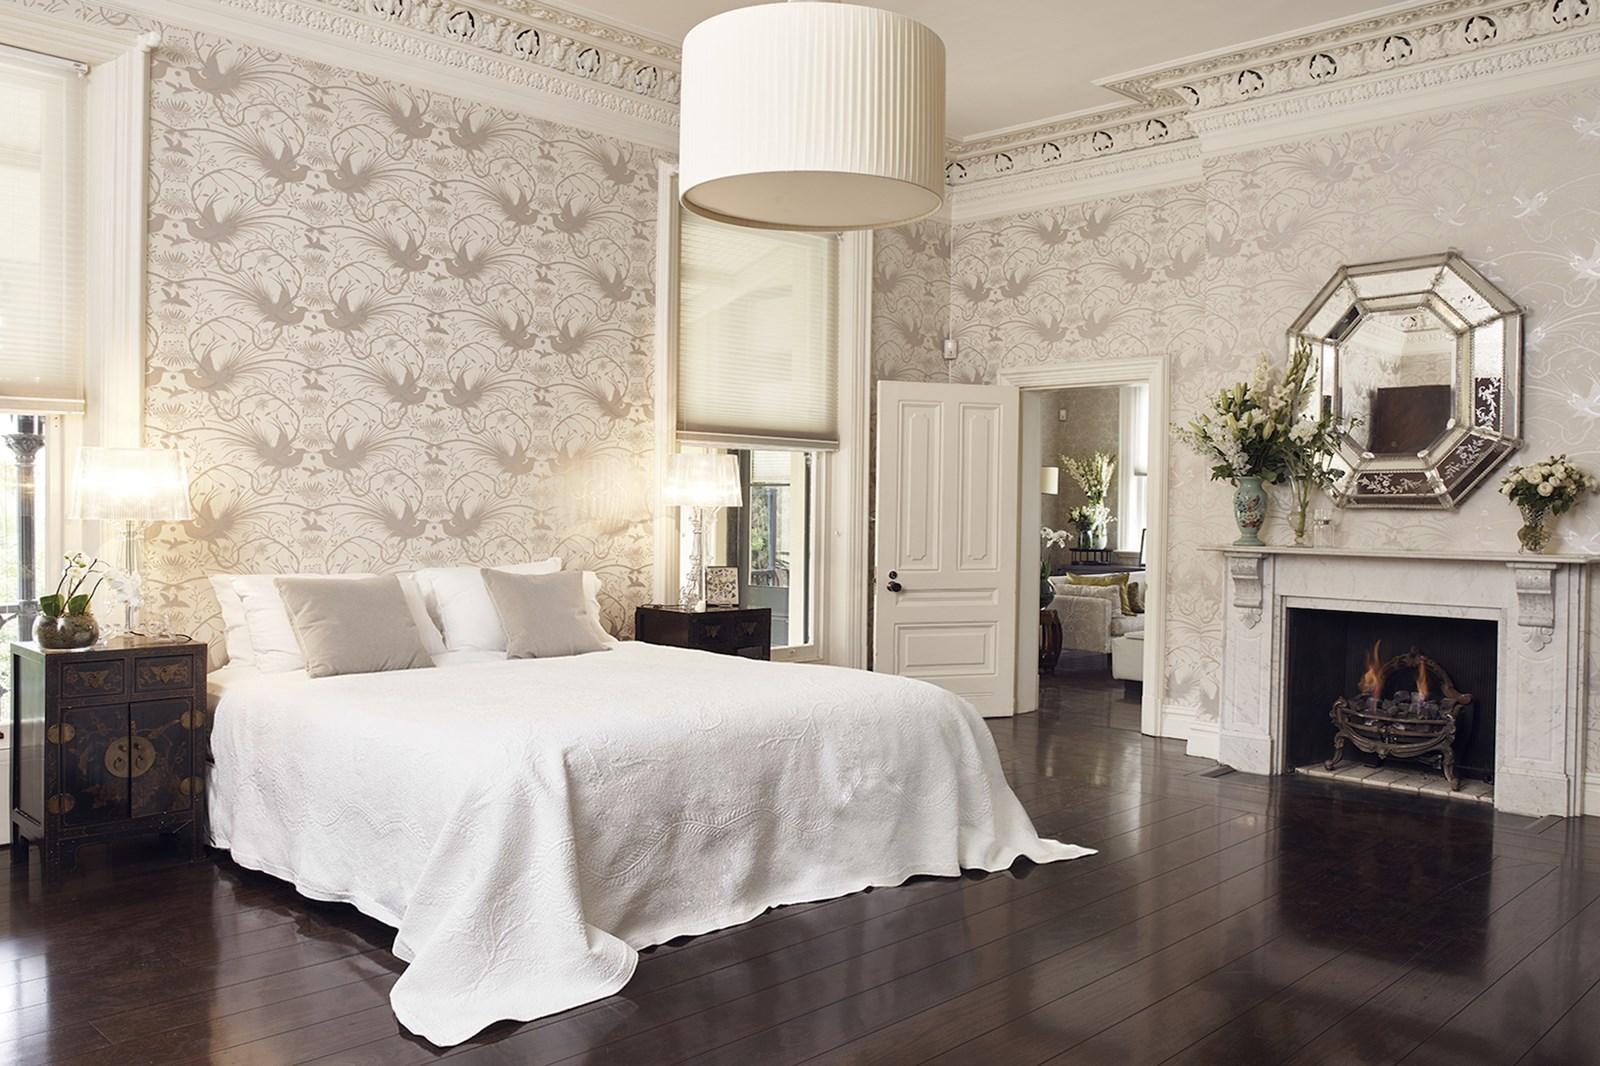 Catherine Martin's bedroom